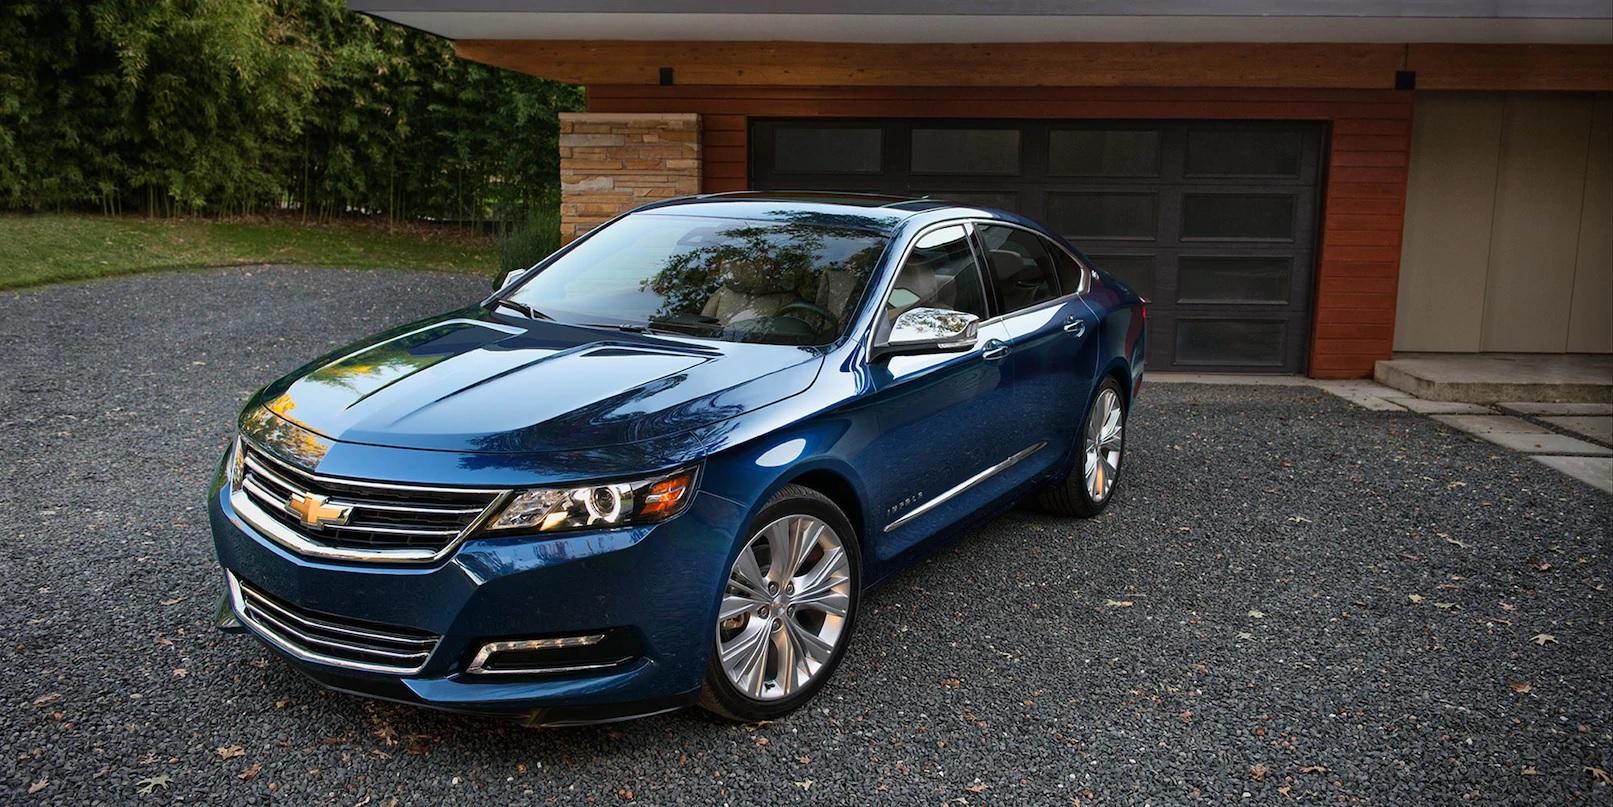 2018 Chevrolet Impala for Sale near Valparaiso, IN